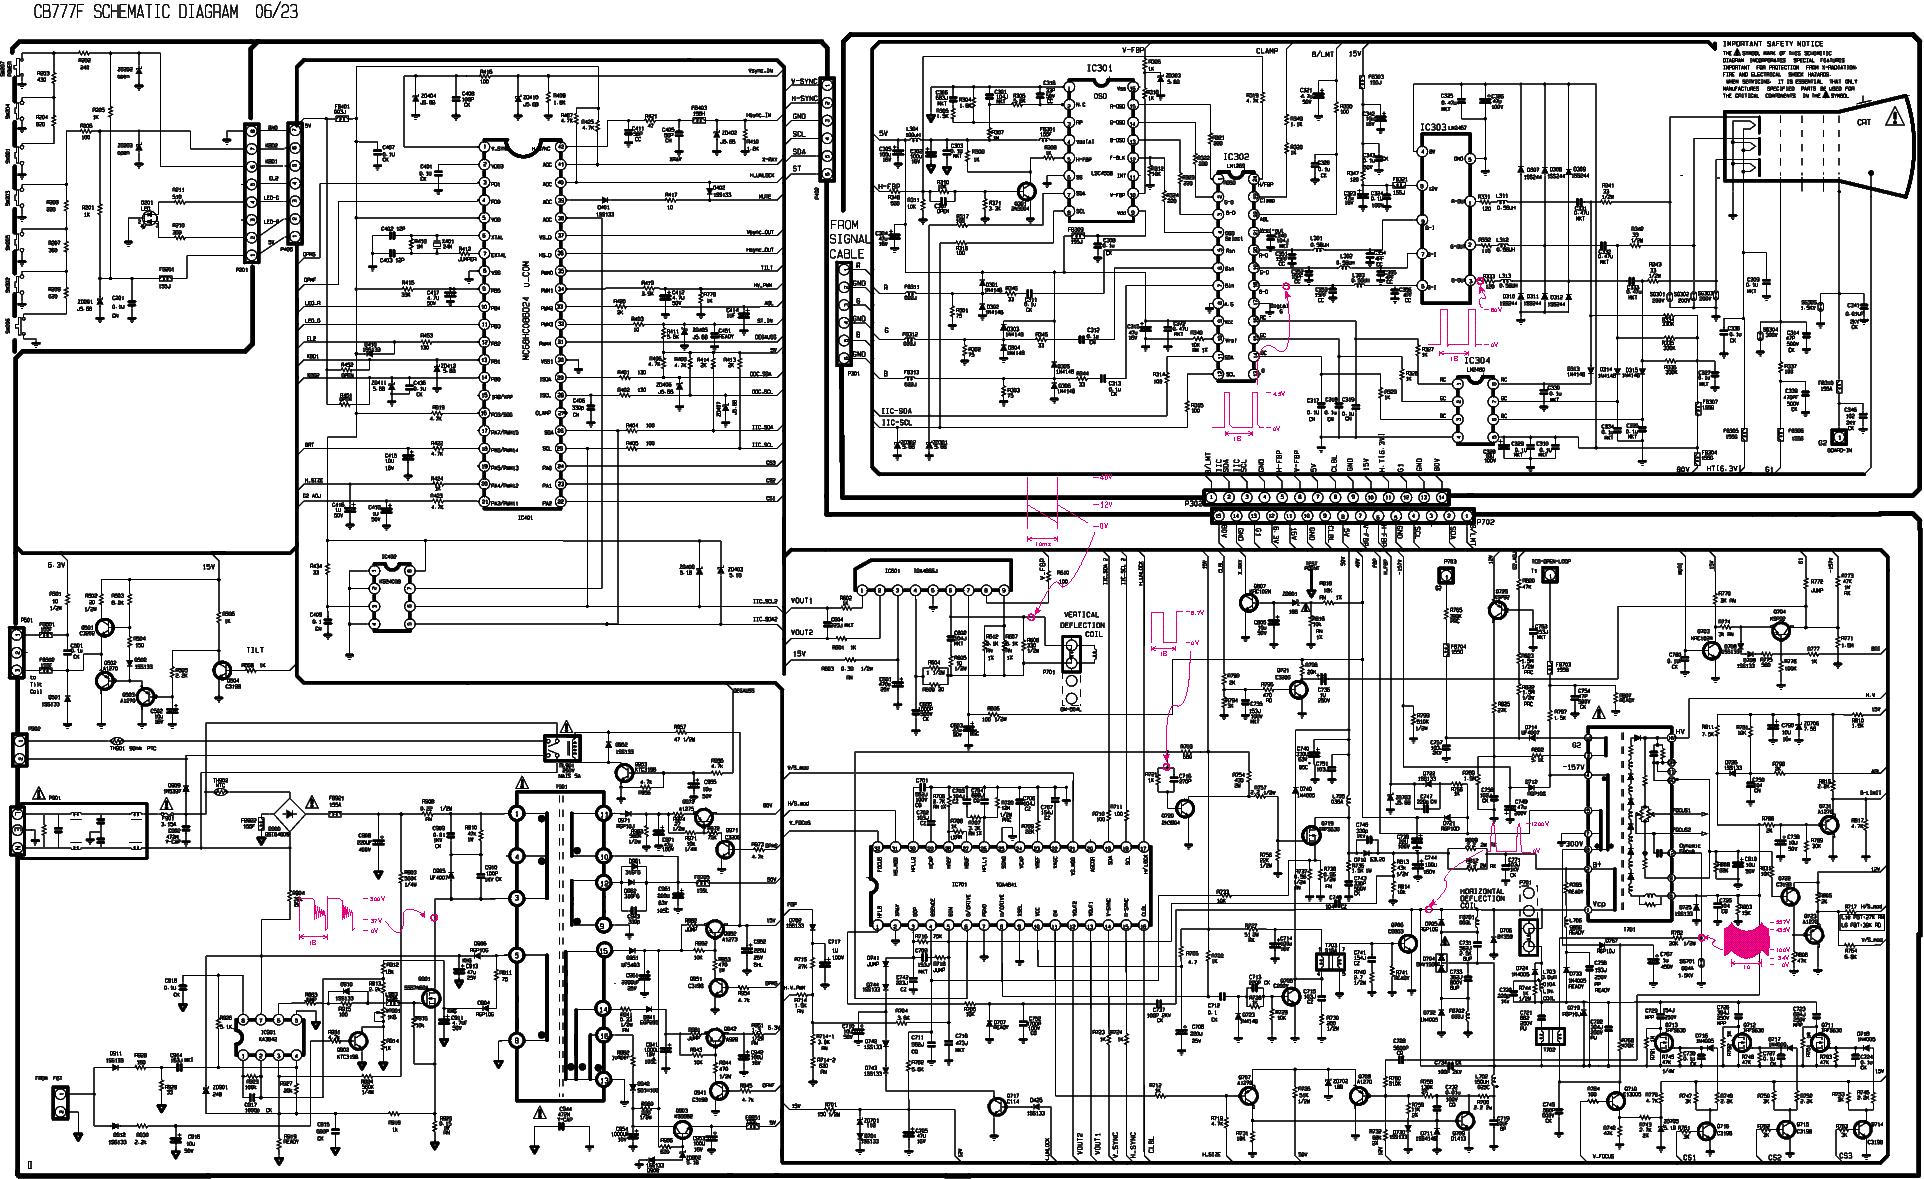 LG 700S WINDOWS 7 X64 DRIVER